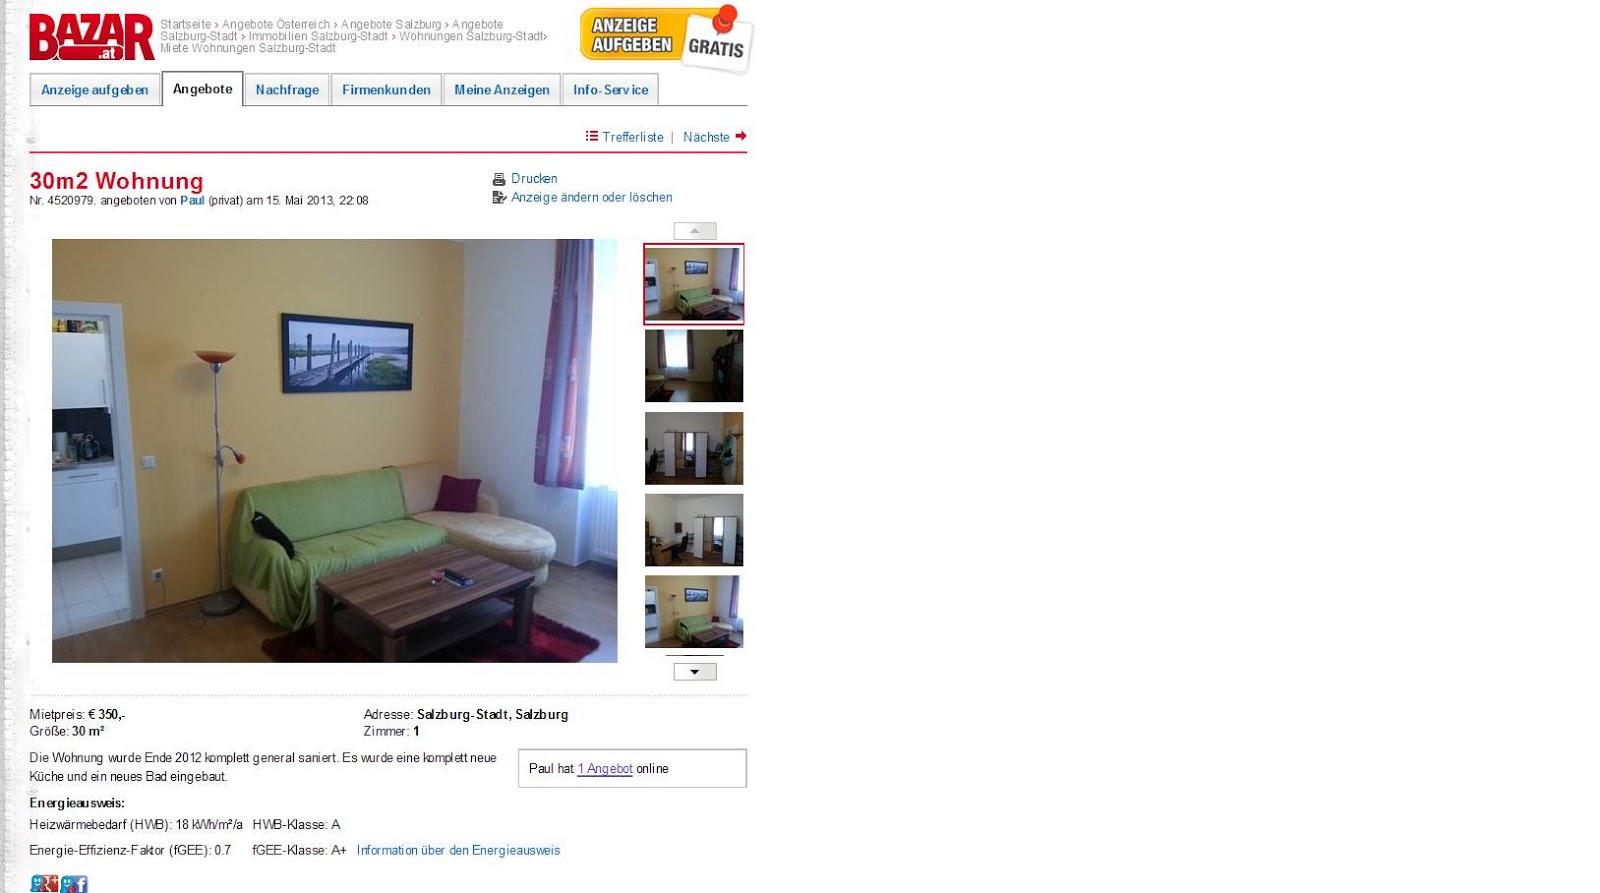 30m2 wohnung salzburg rupertgasse 13 5020 salzburg. Black Bedroom Furniture Sets. Home Design Ideas